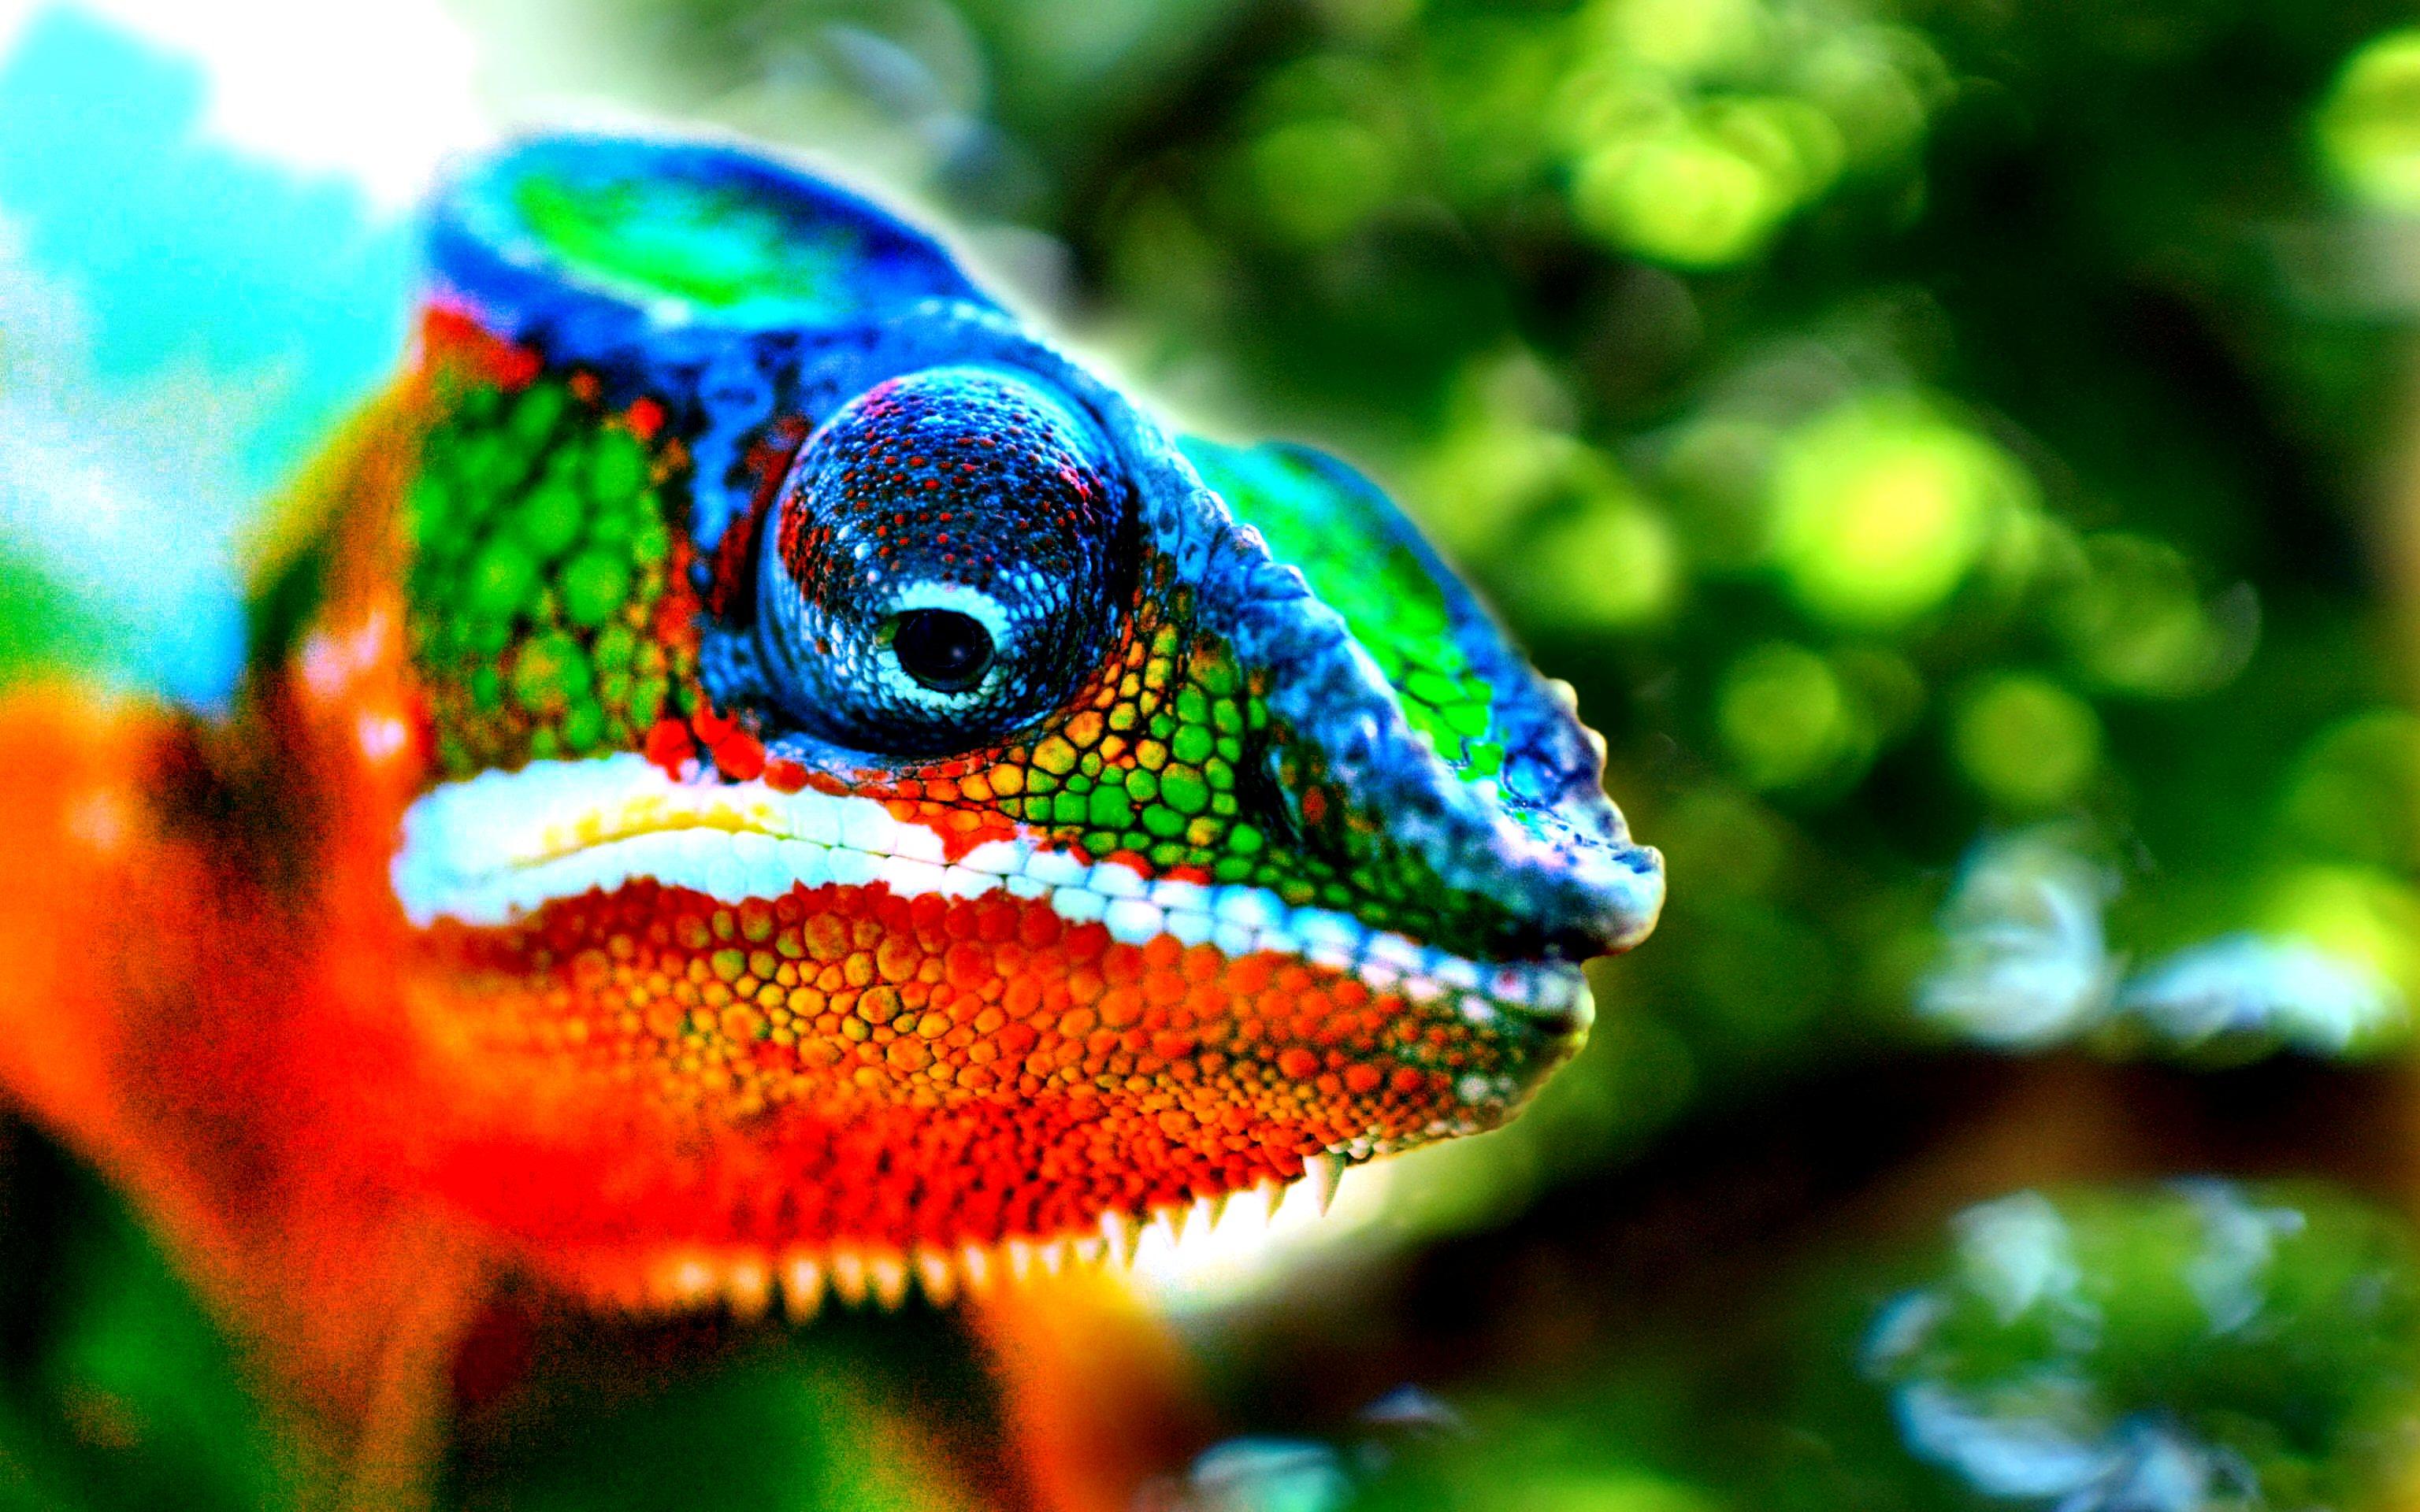 Colorful animal wallpaper